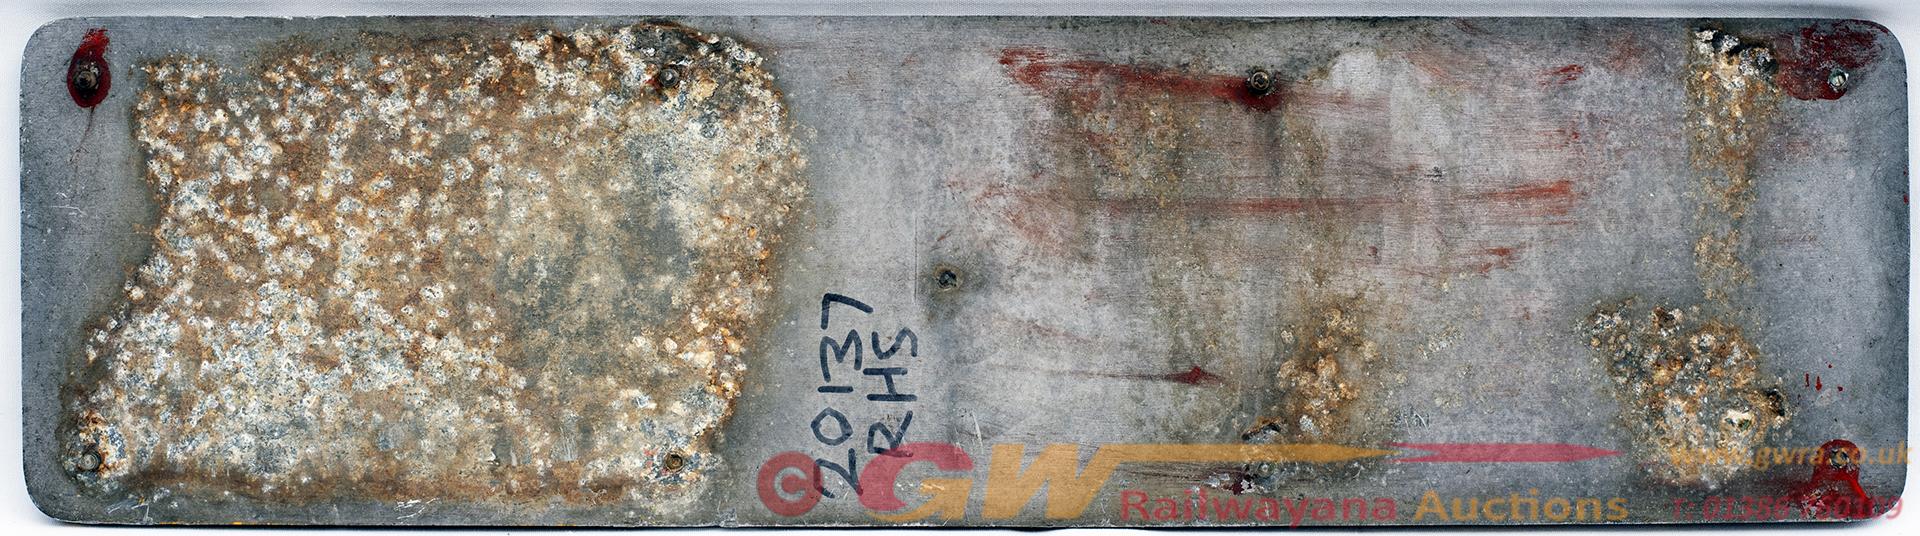 Railfreight Sectorisation Cast Aluminium Plate